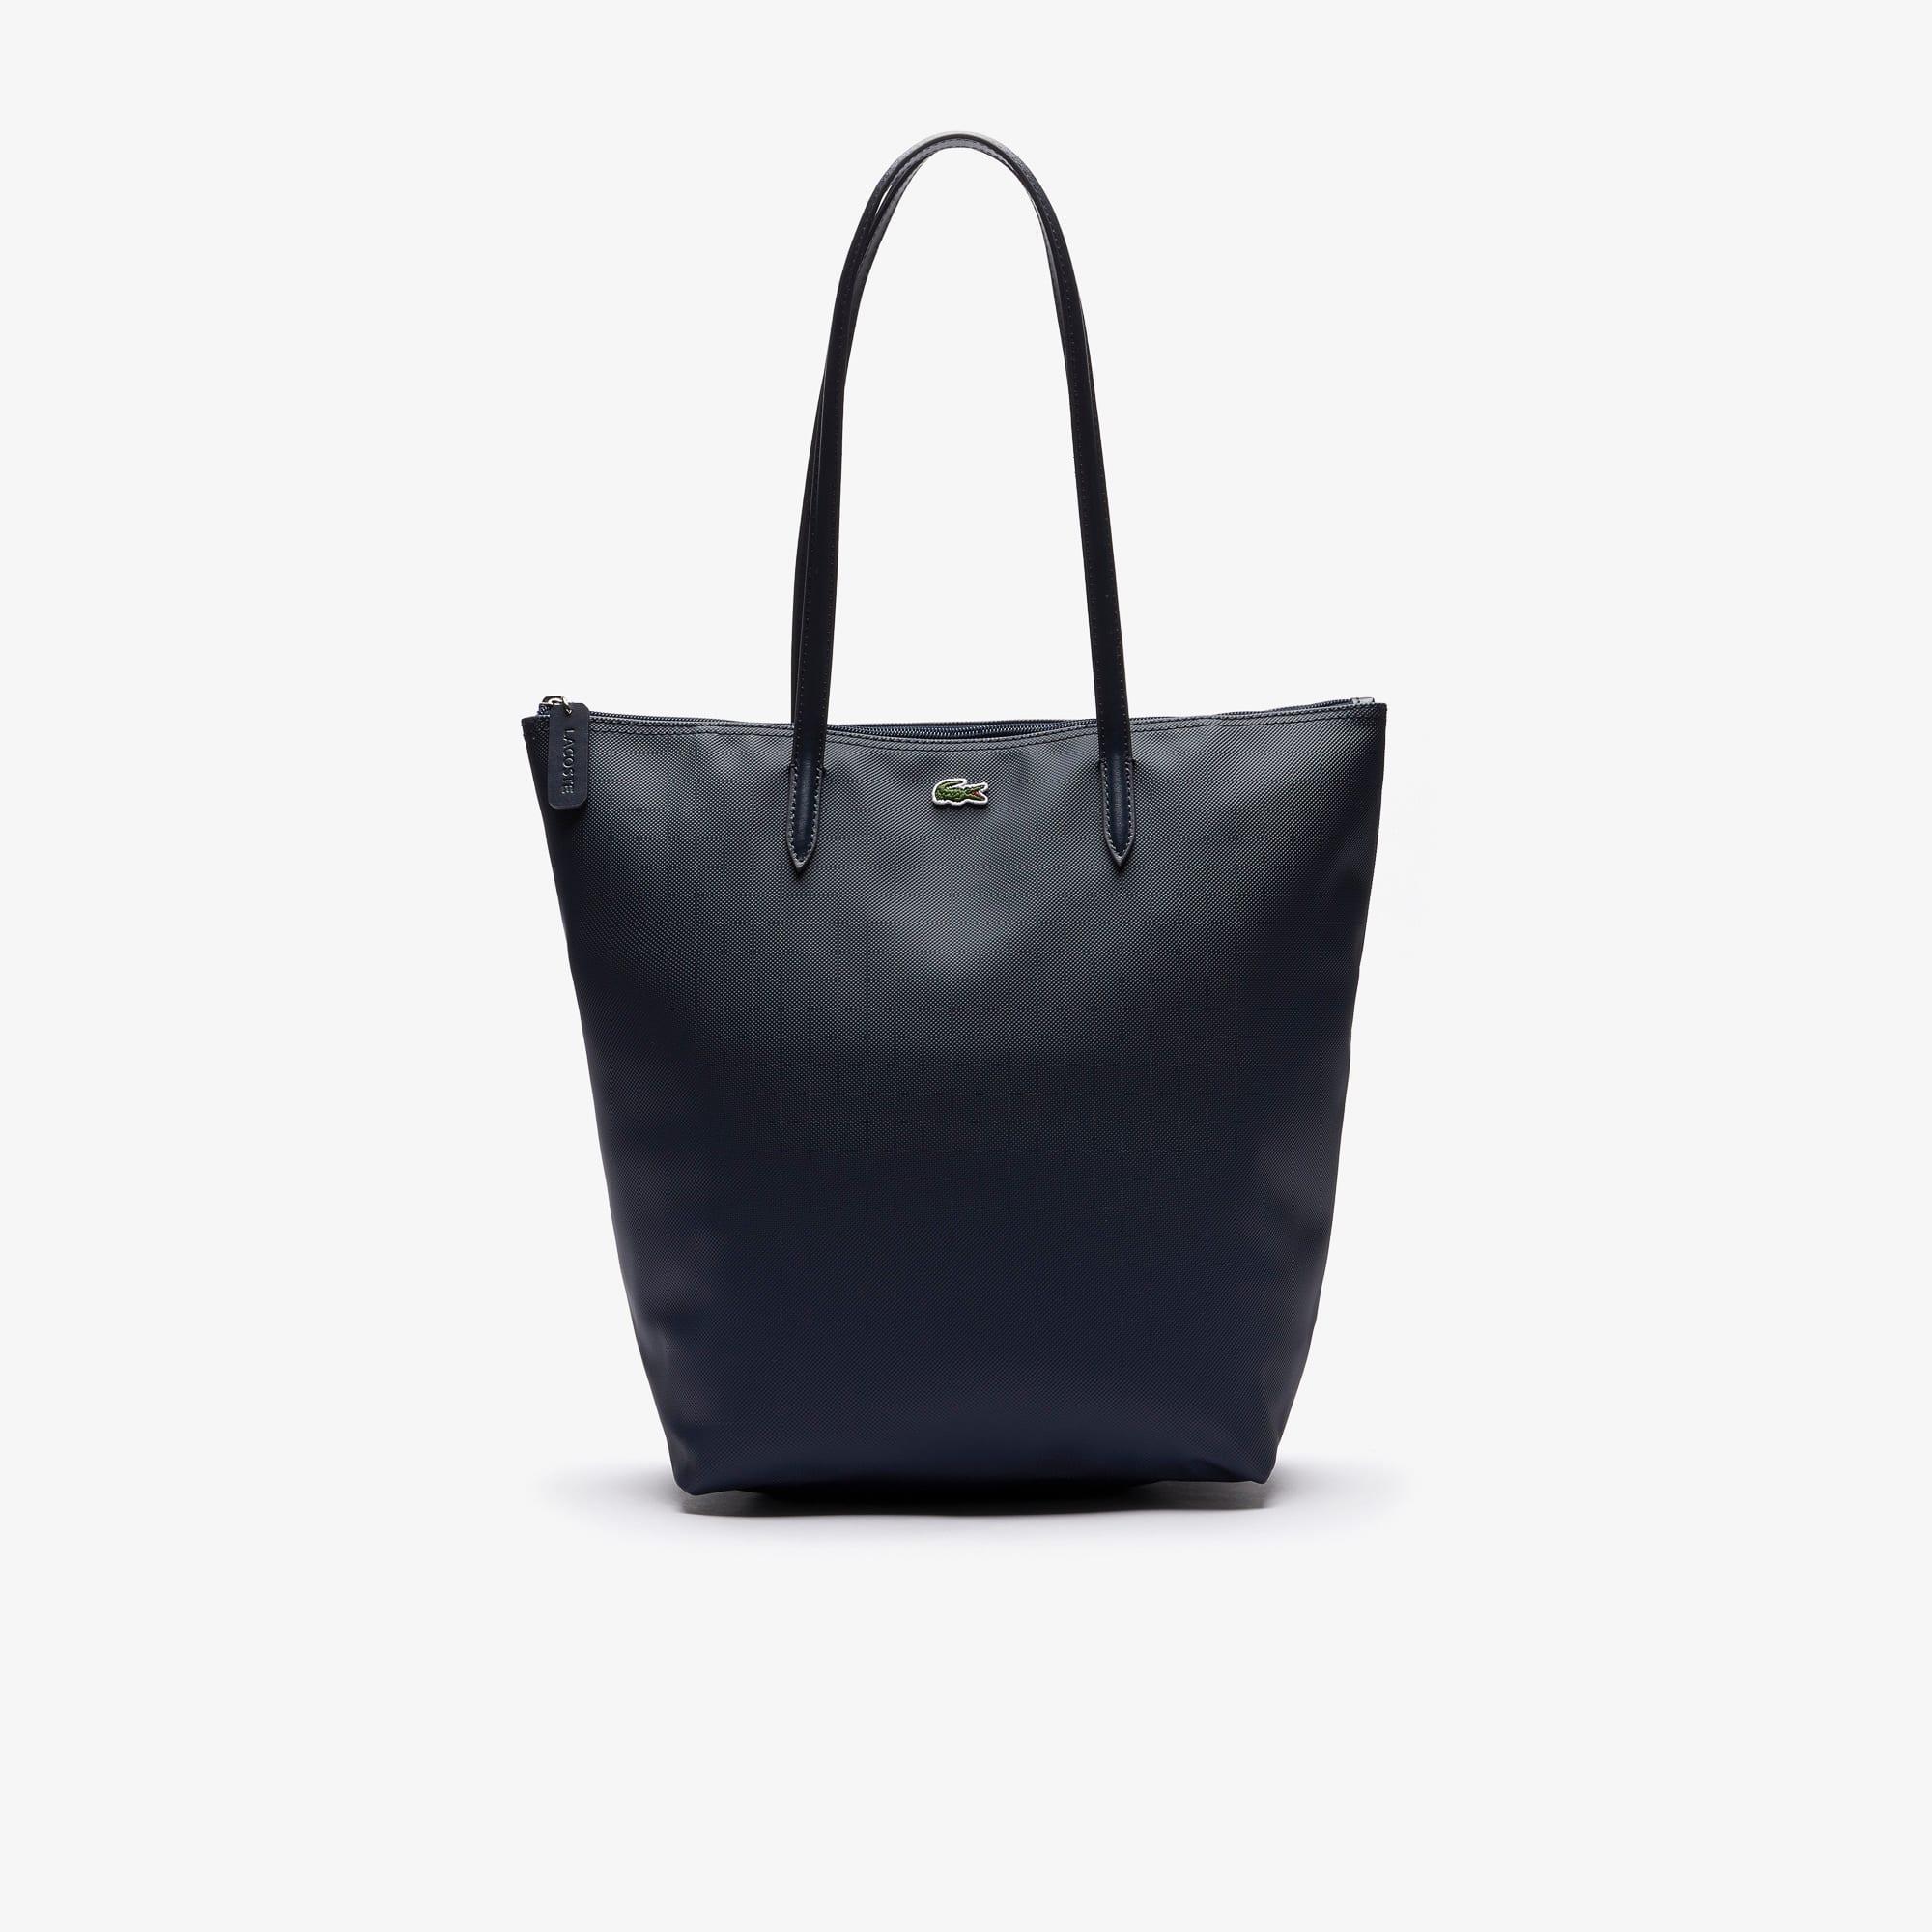 das Neueste a8817 c97d8 L.12.12 Taschen Kollektion | Lederwaren Damen | LACOSTE